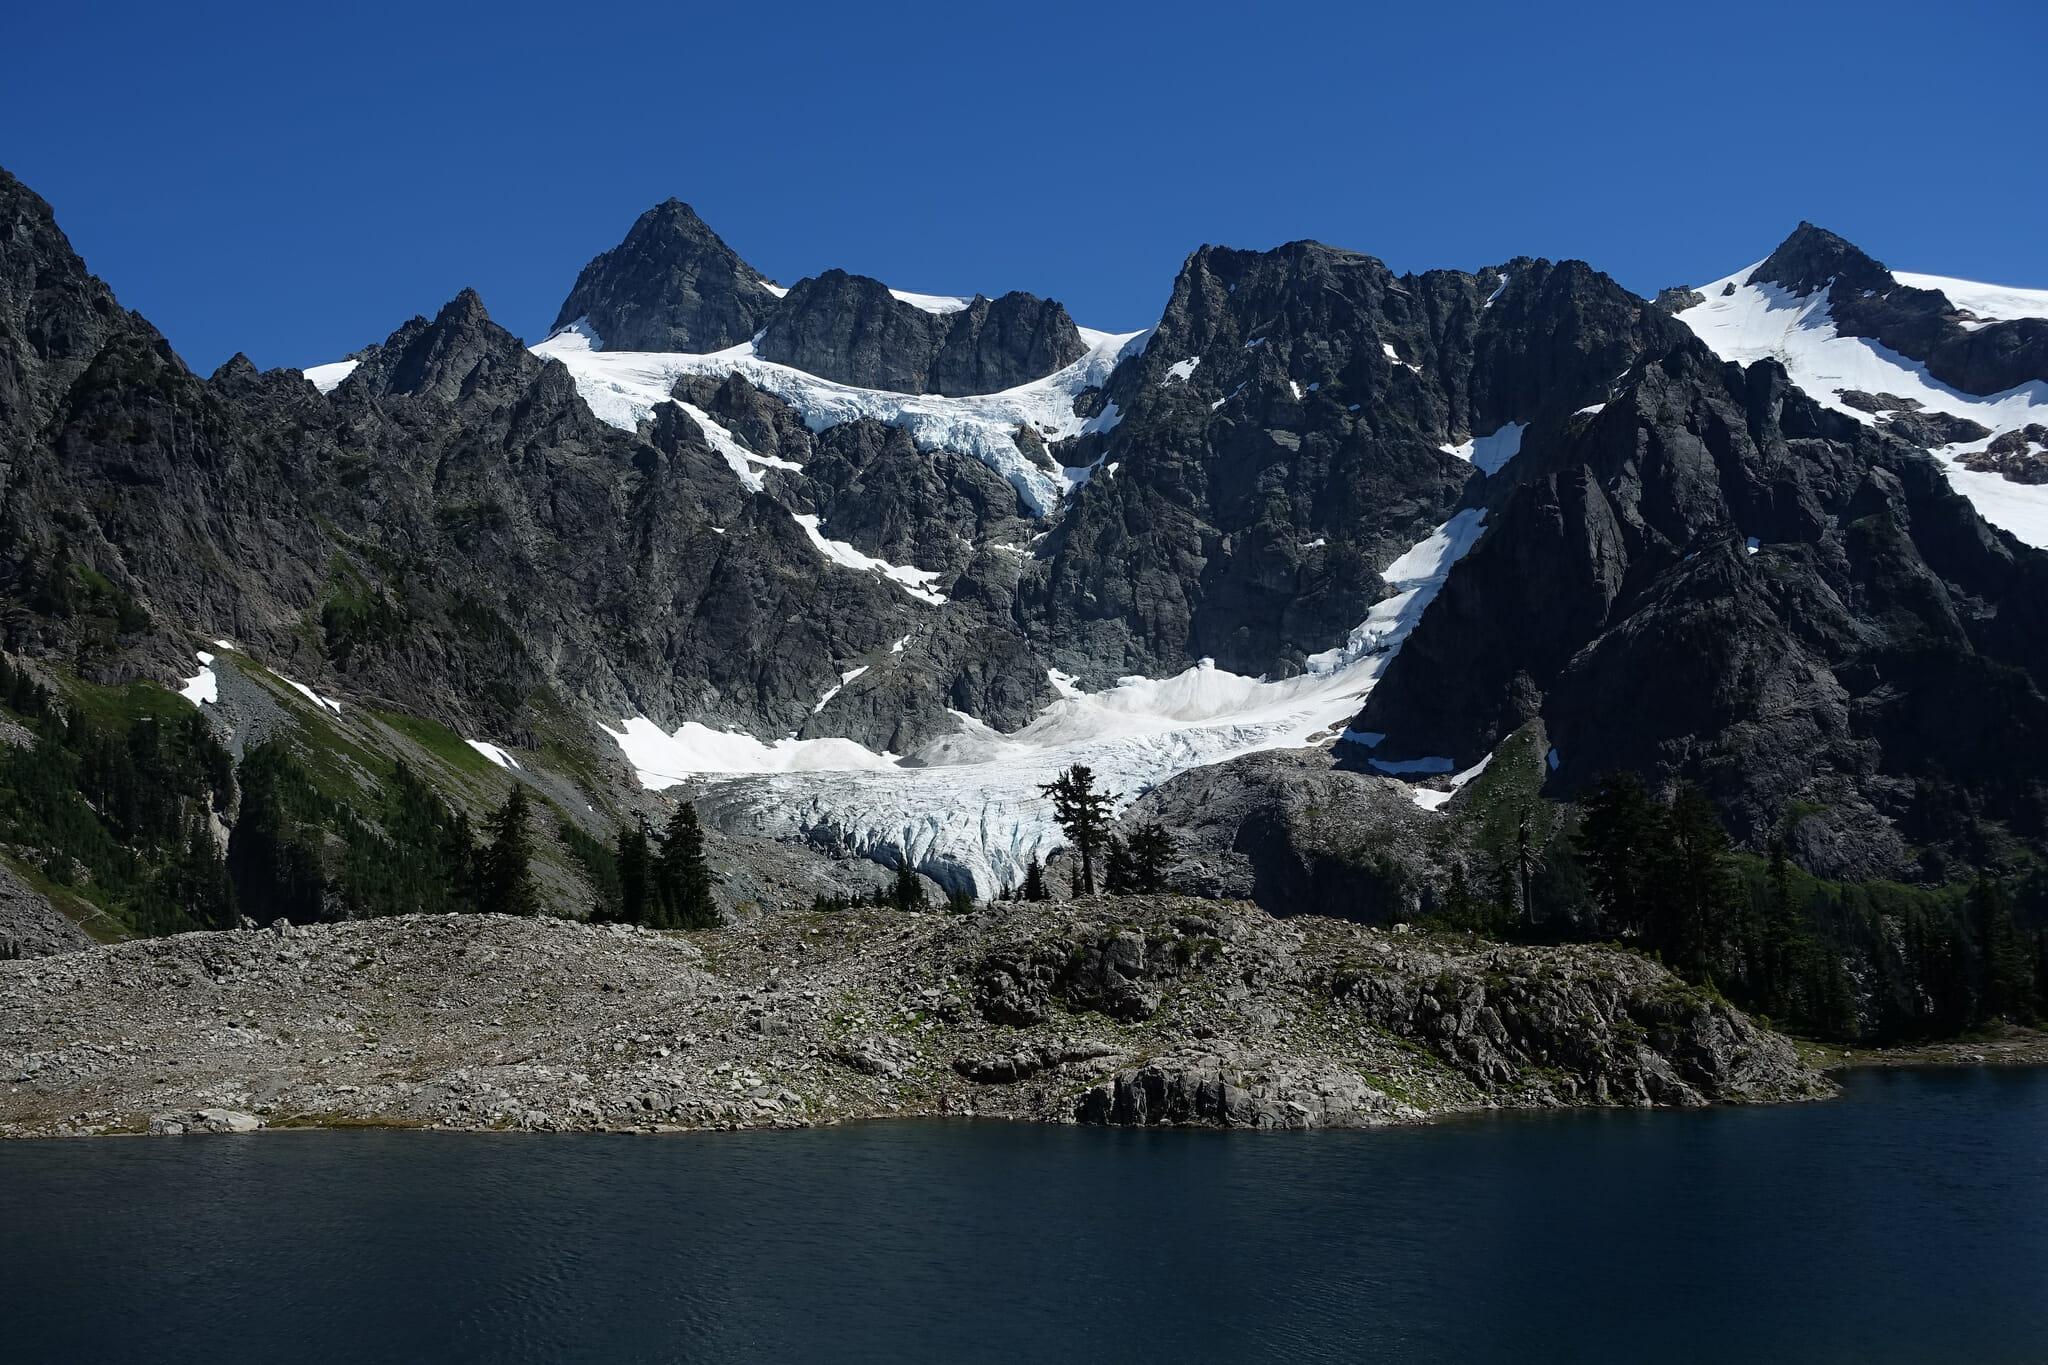 Lake Ann and Mount Shuksan